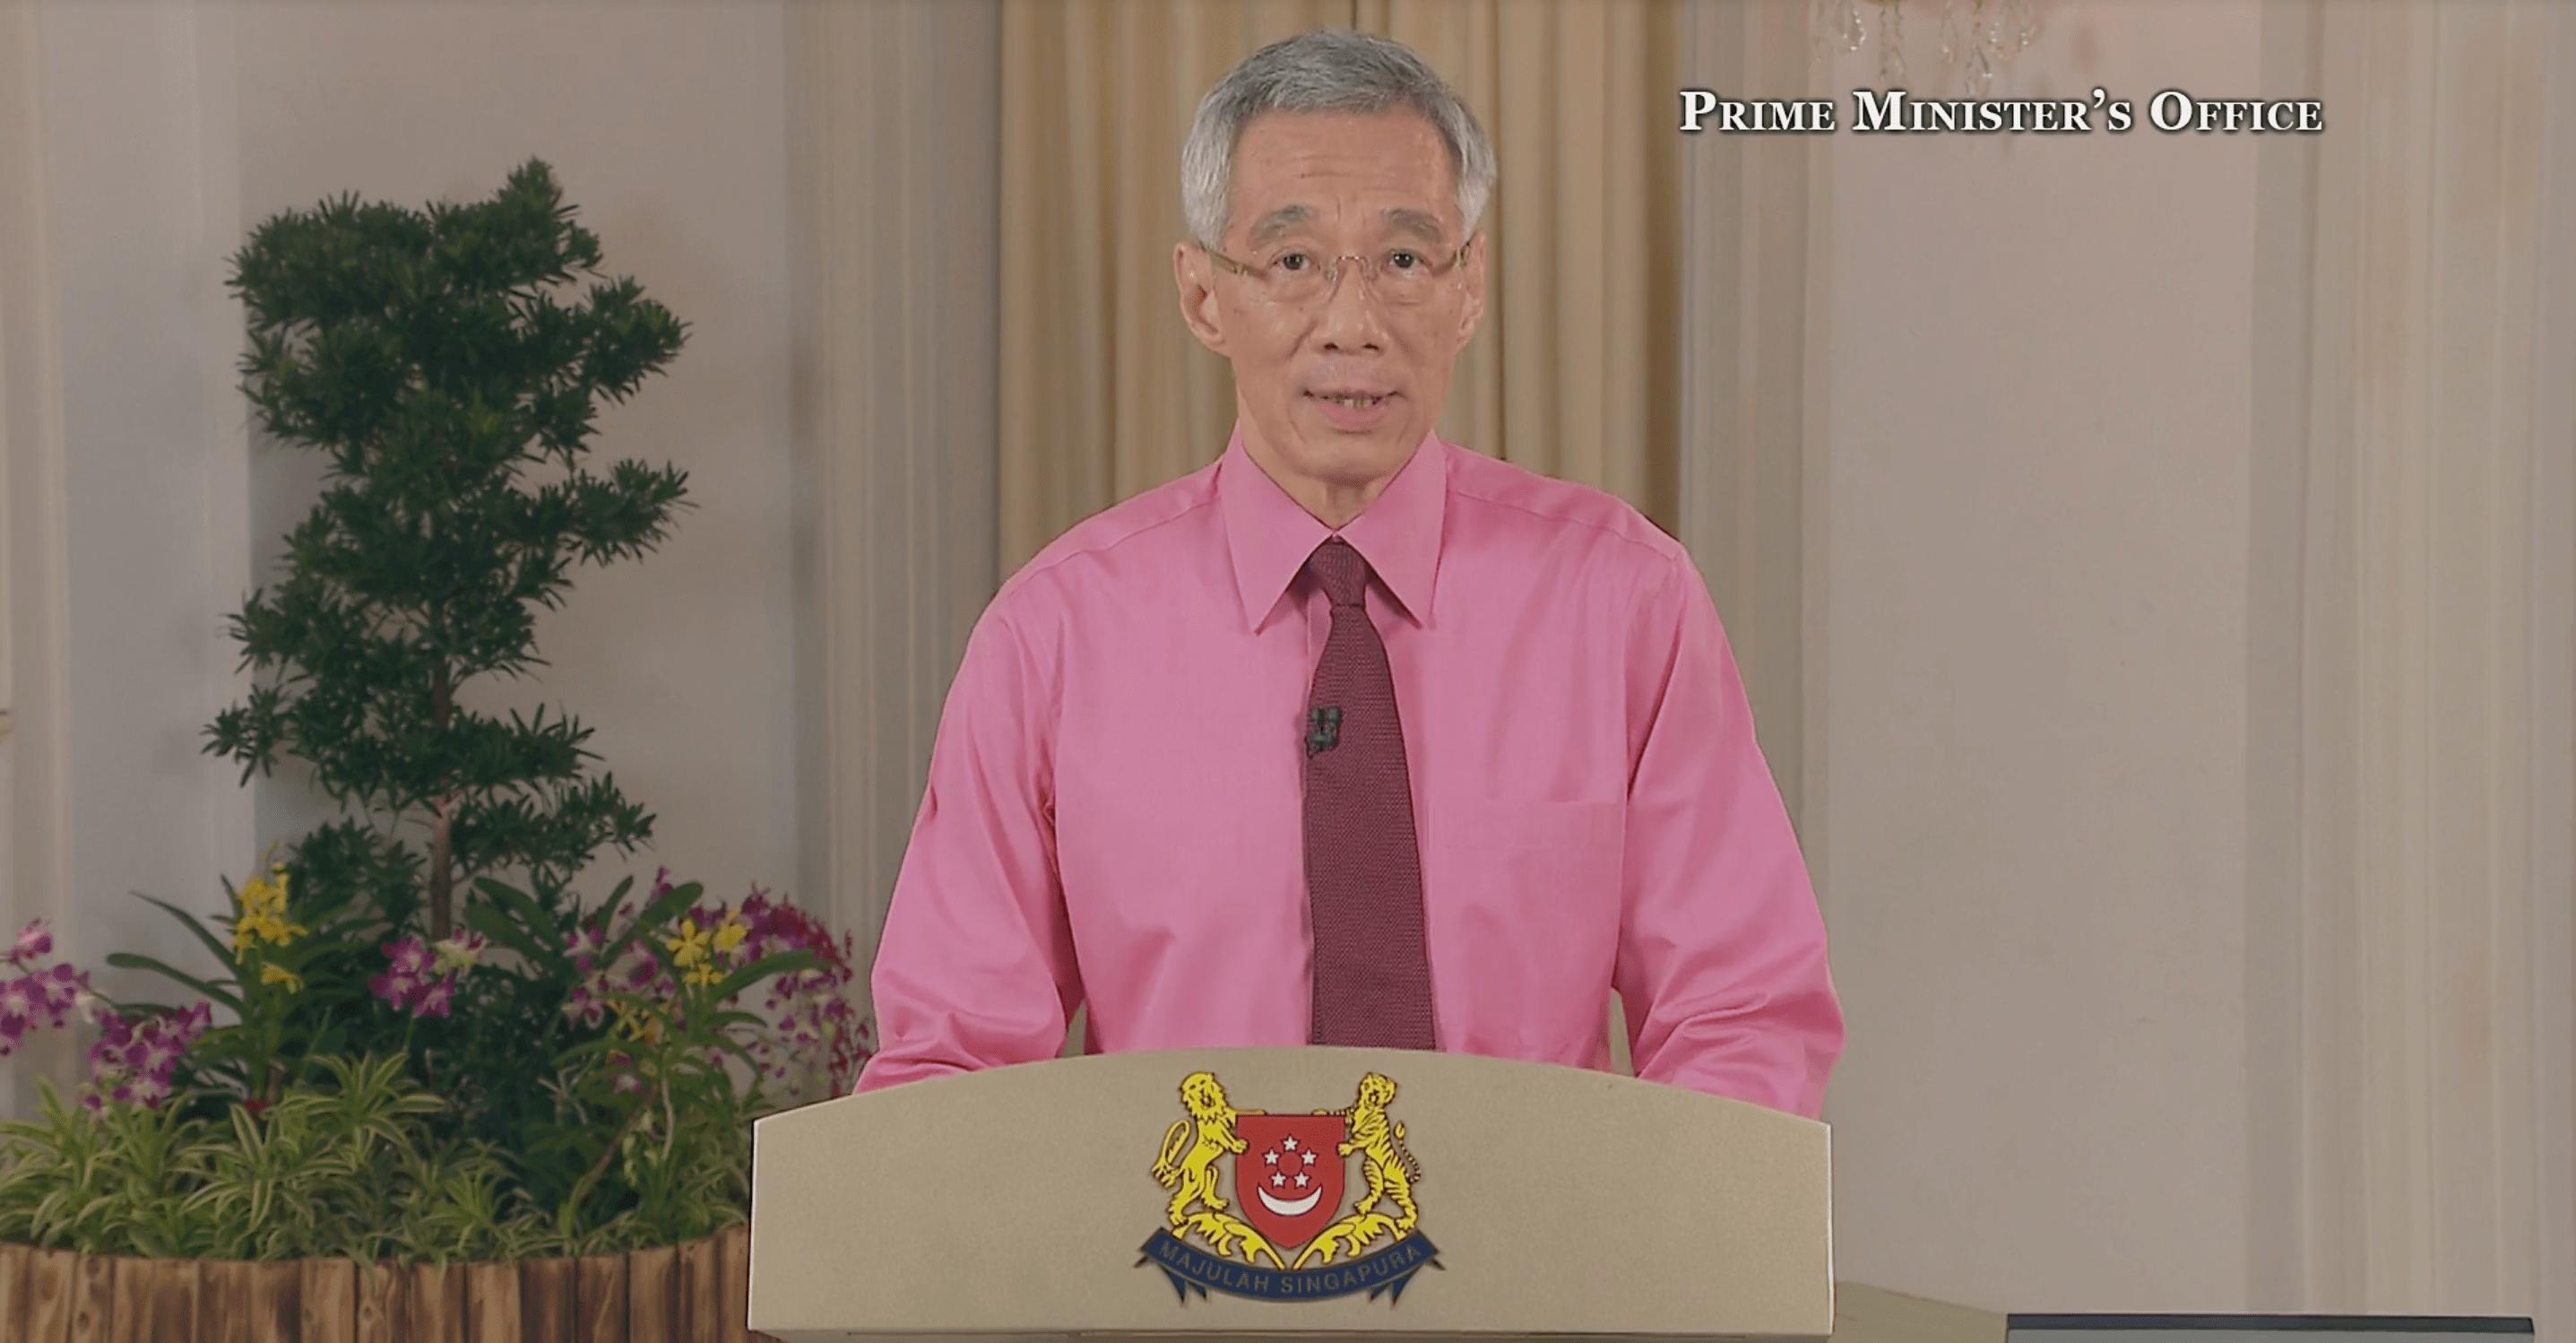 PM Lee address 31 may